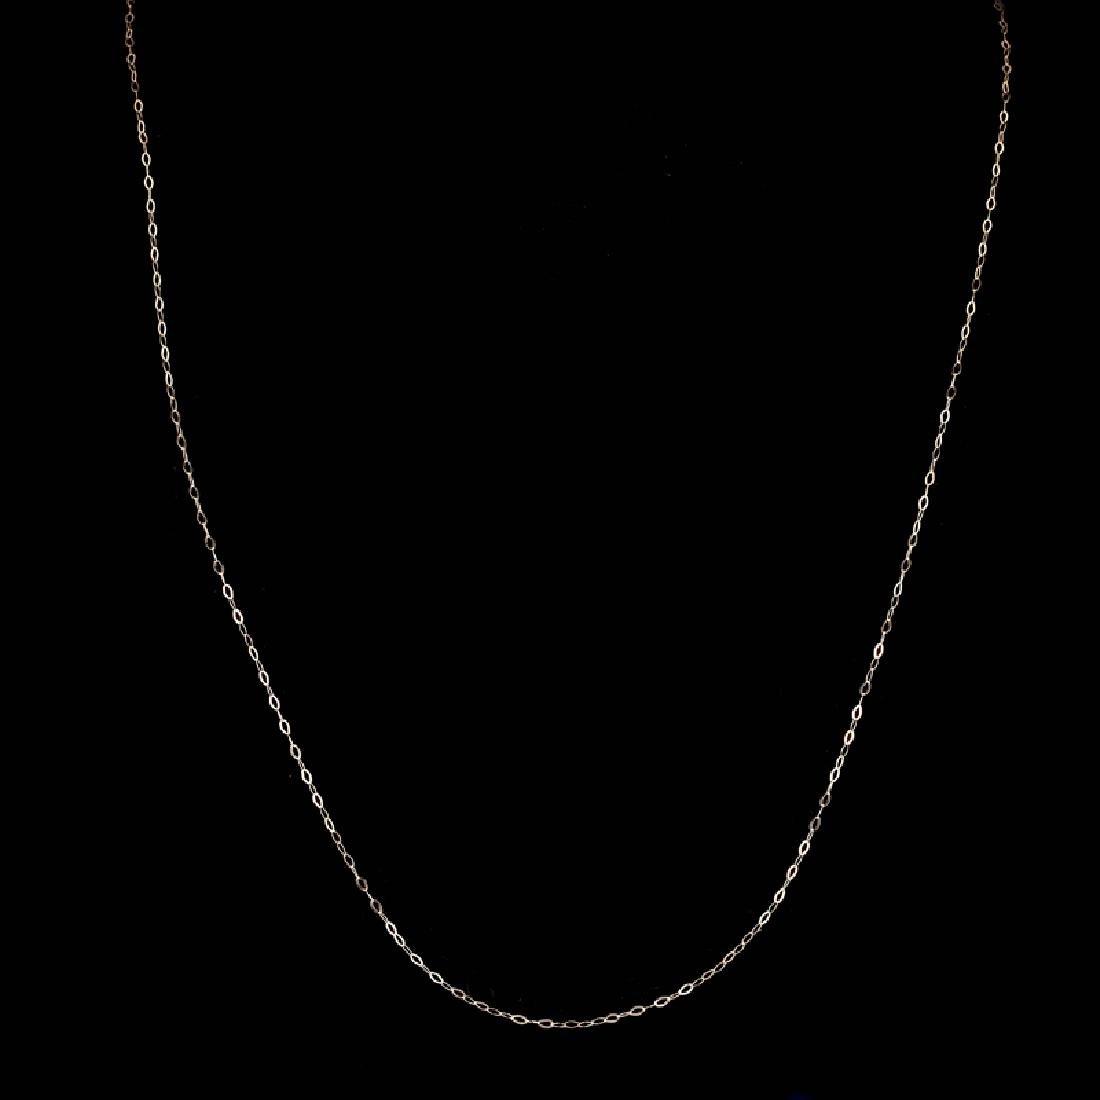 *Fine Jewelry 14KT White Gold, 18'' Diamond Cut Link